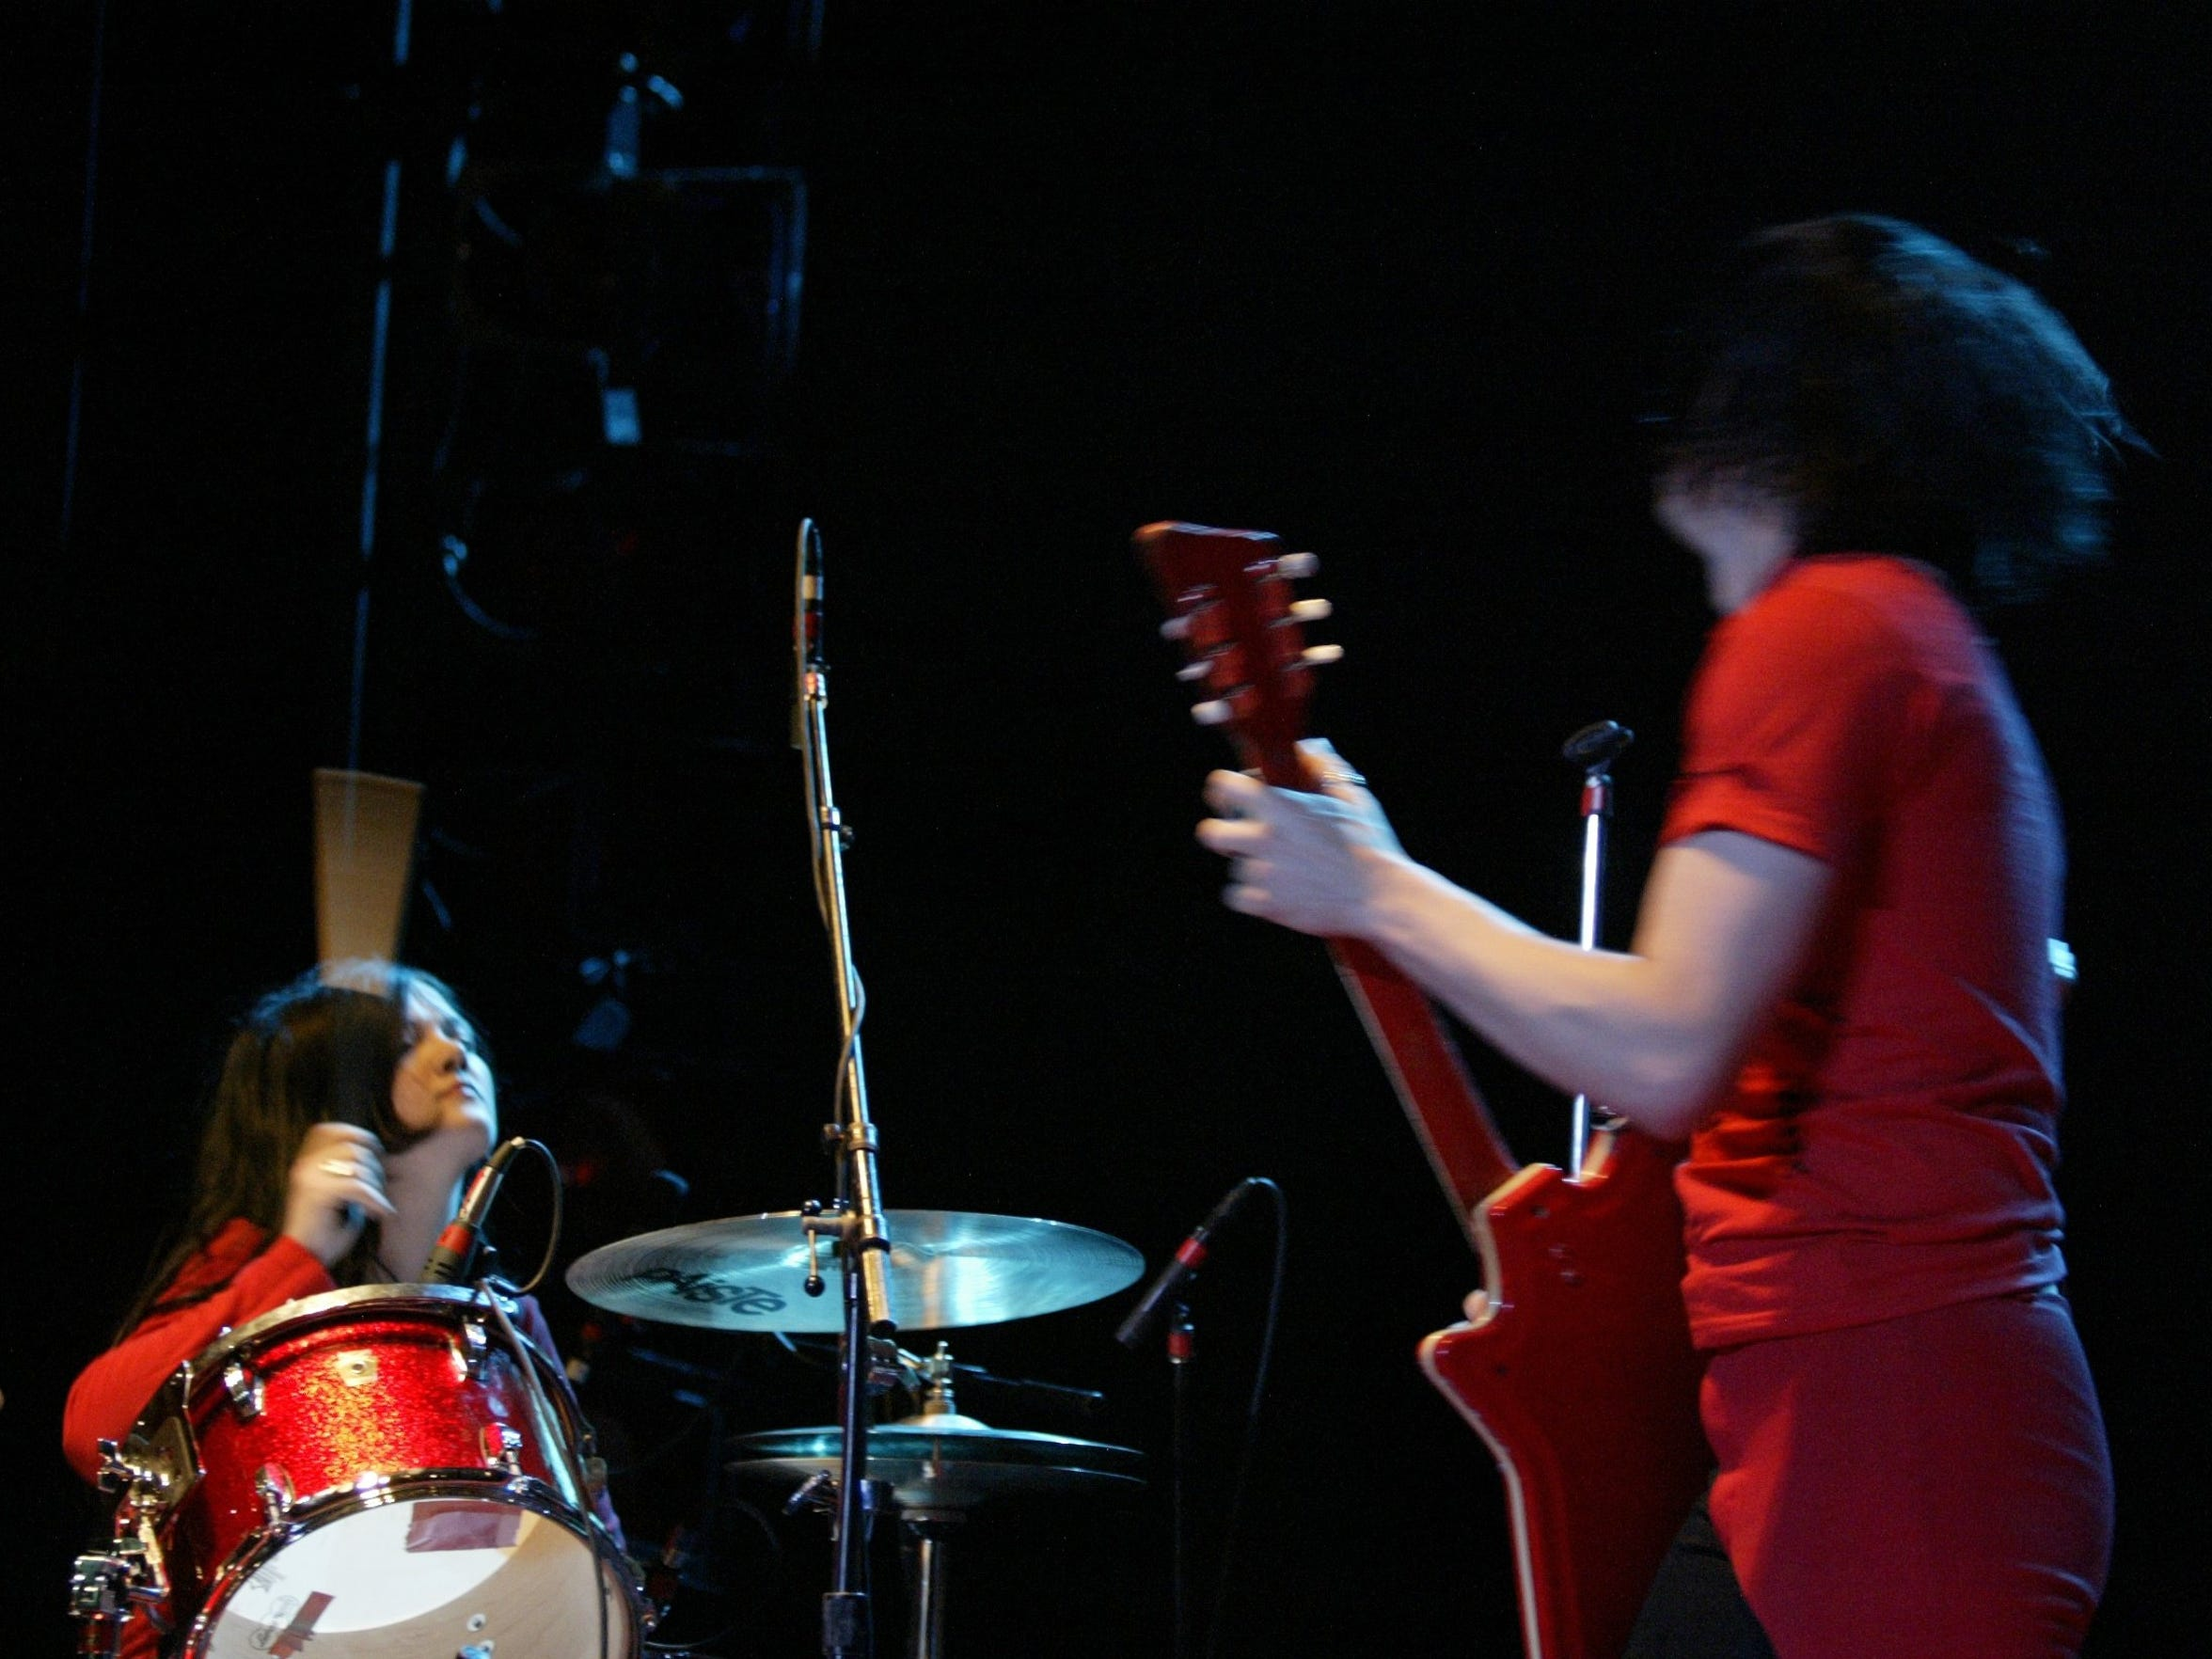 Jack and Meg White performing at Detroit's Masonic